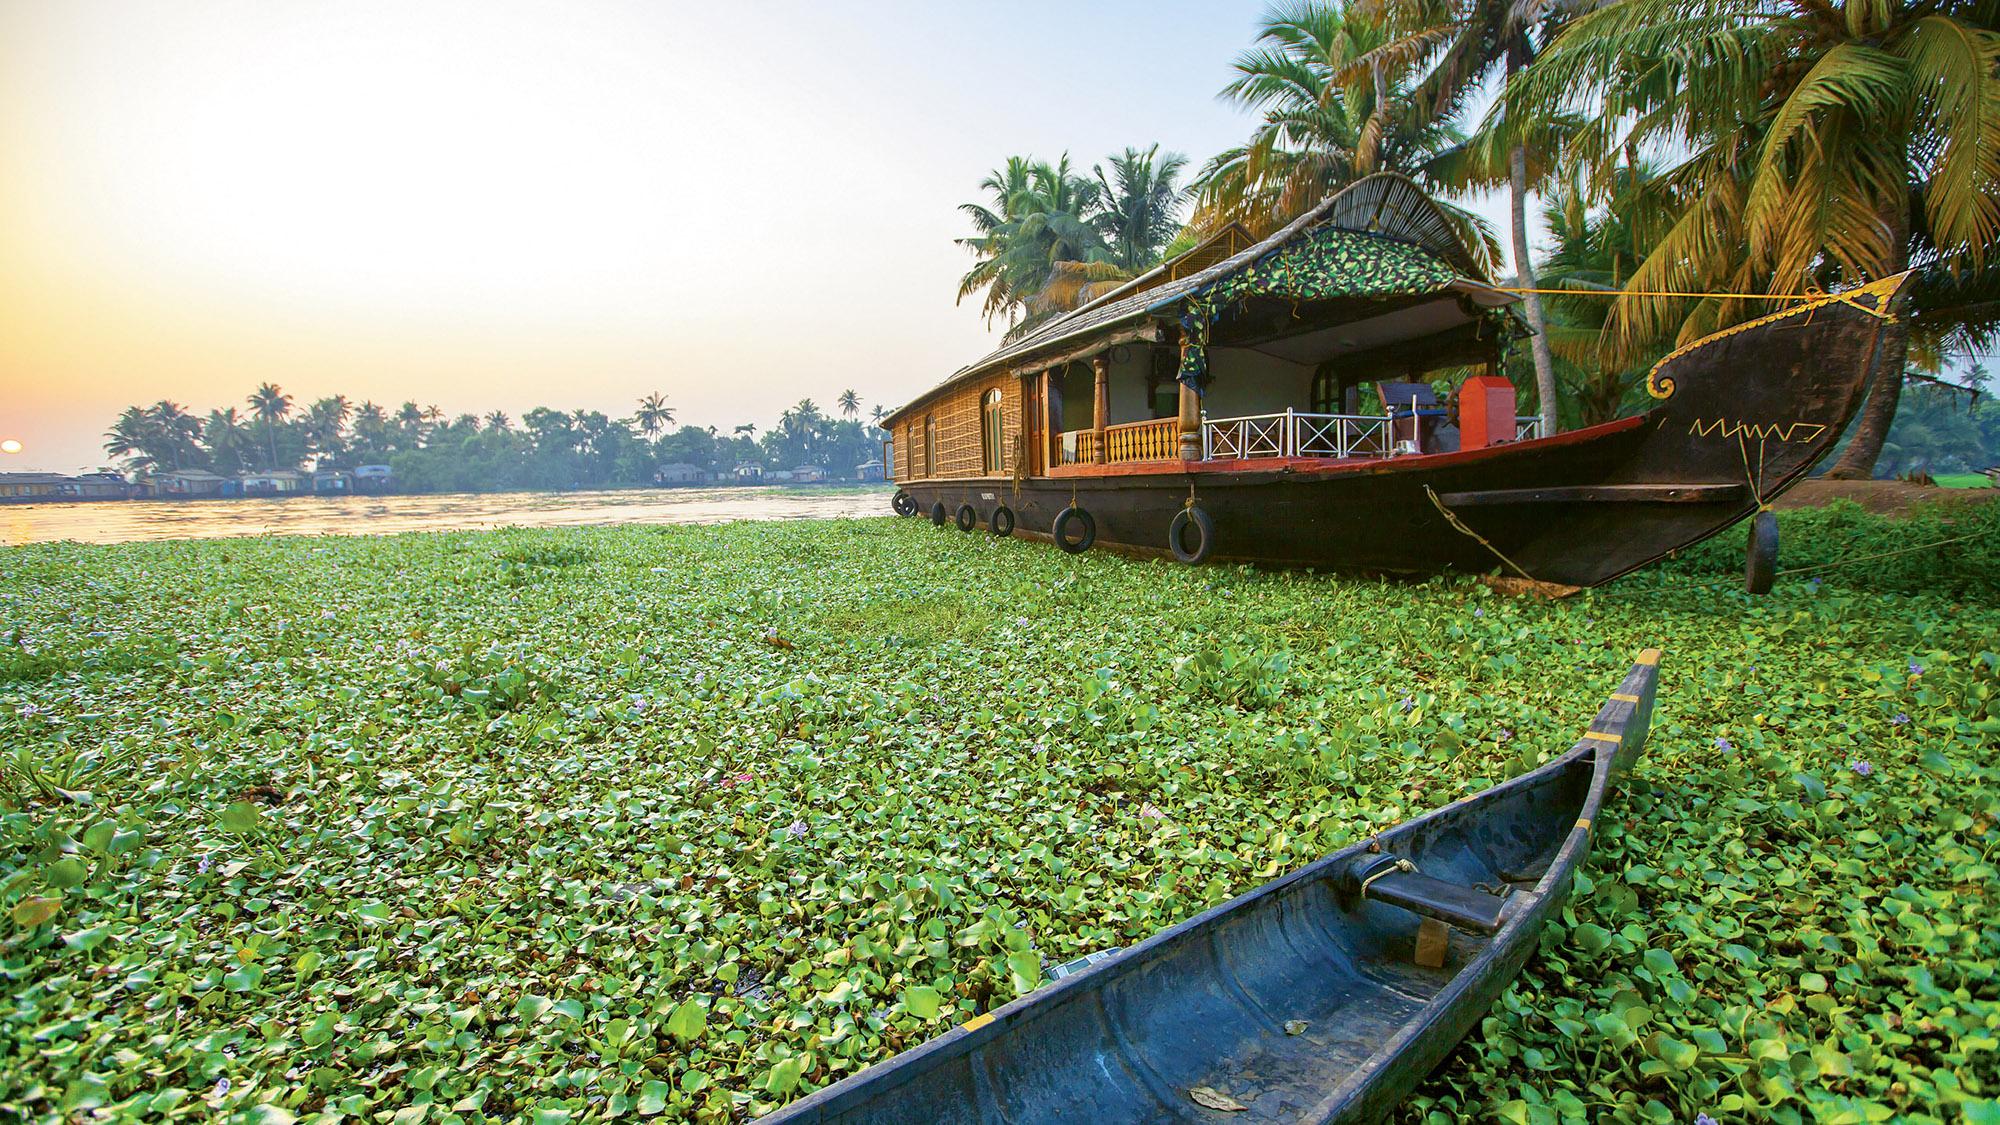 A kettuvallam, or houseboat, cruises the backwaters of Kerala.